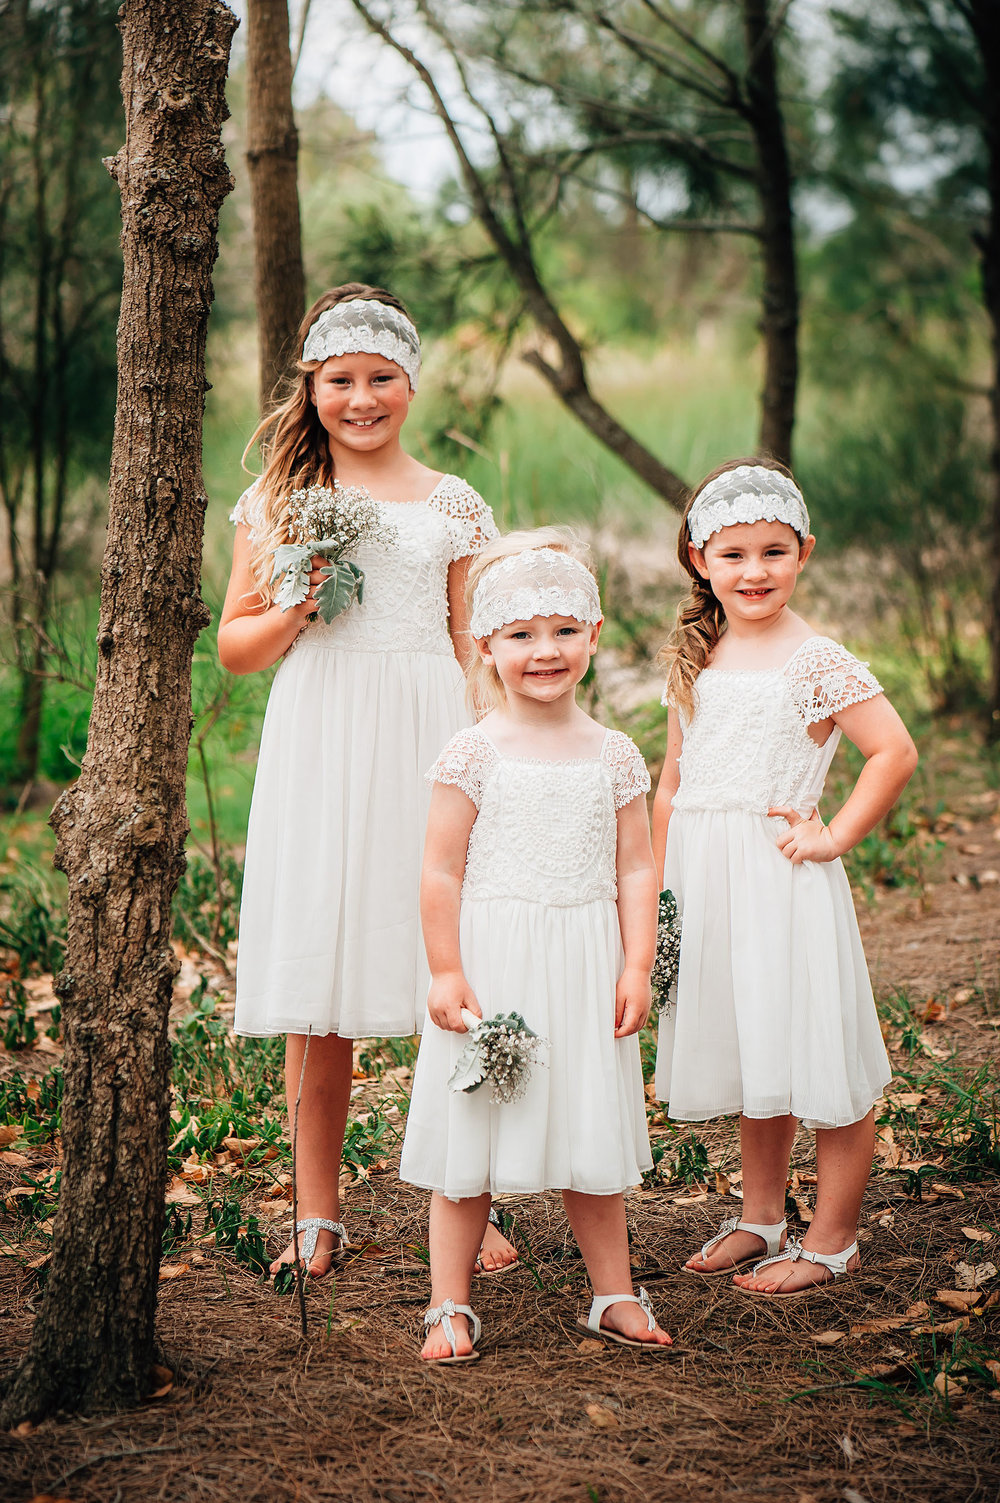 Marryme_wedding_photography_dorrigo_bellingen_photographer_18.jpg